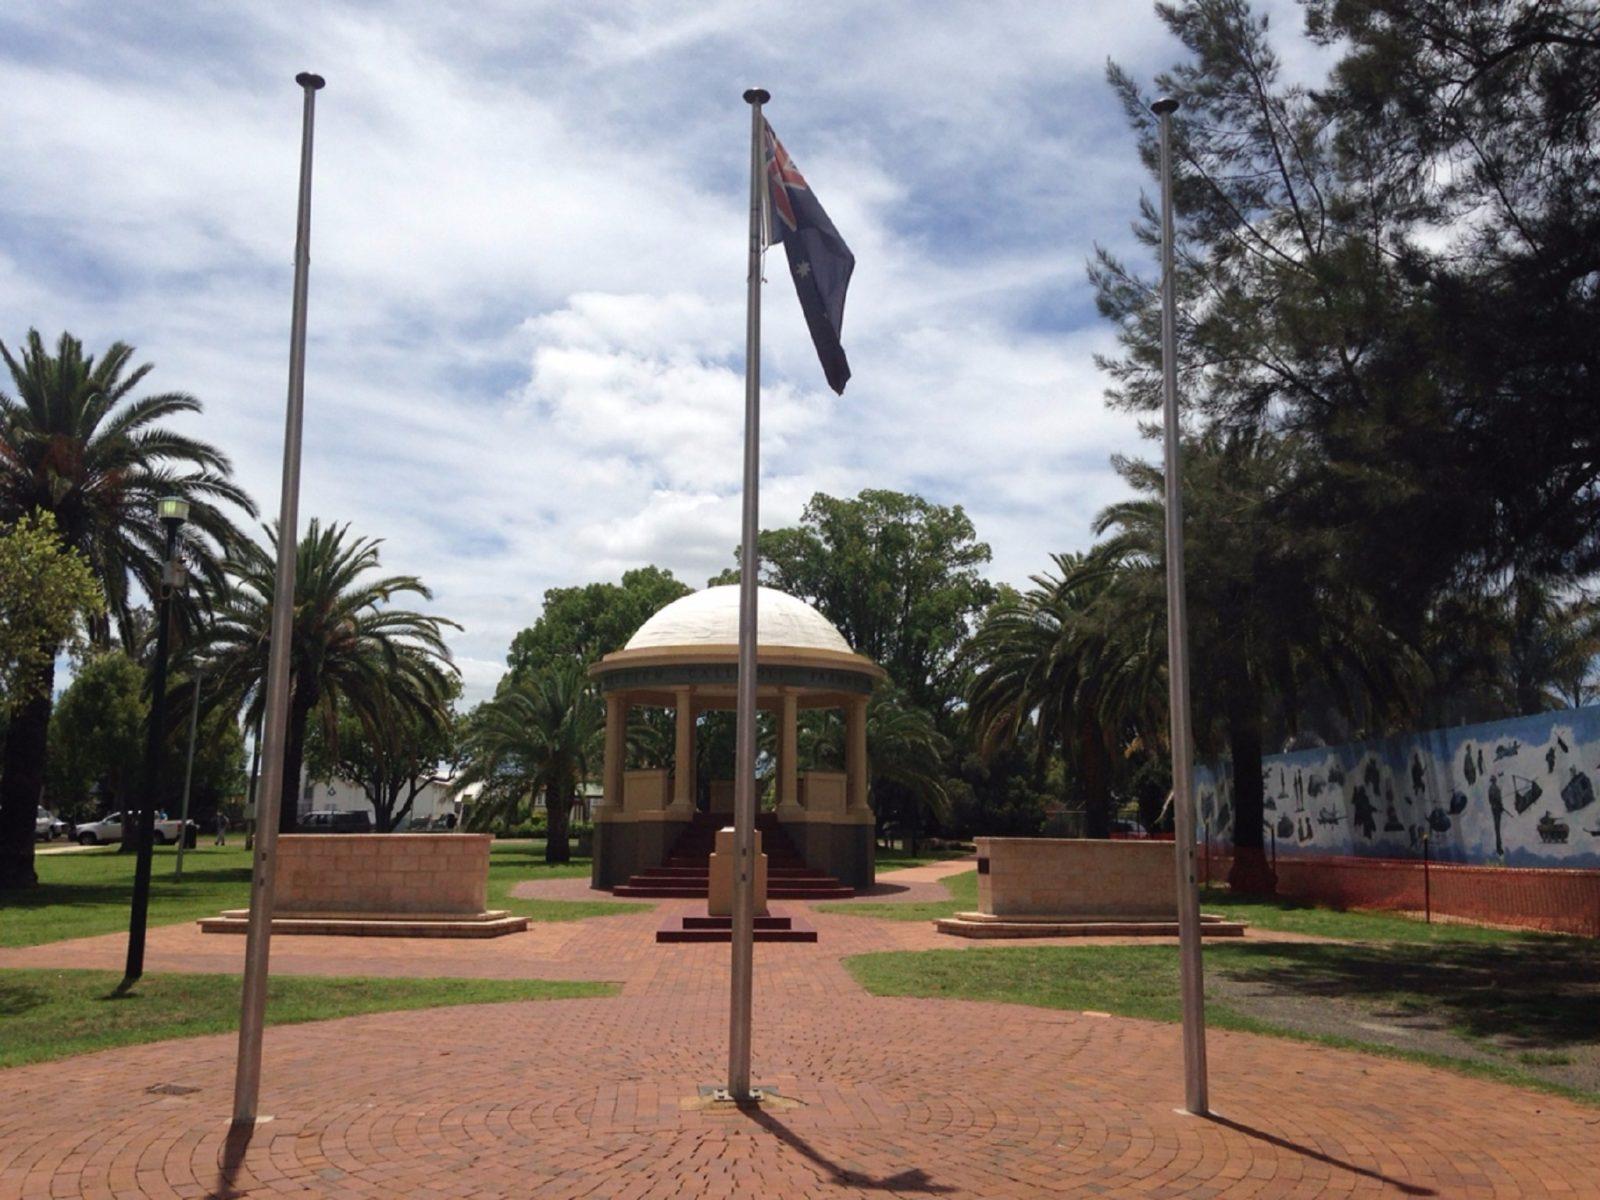 Kingaroy Memorial Park